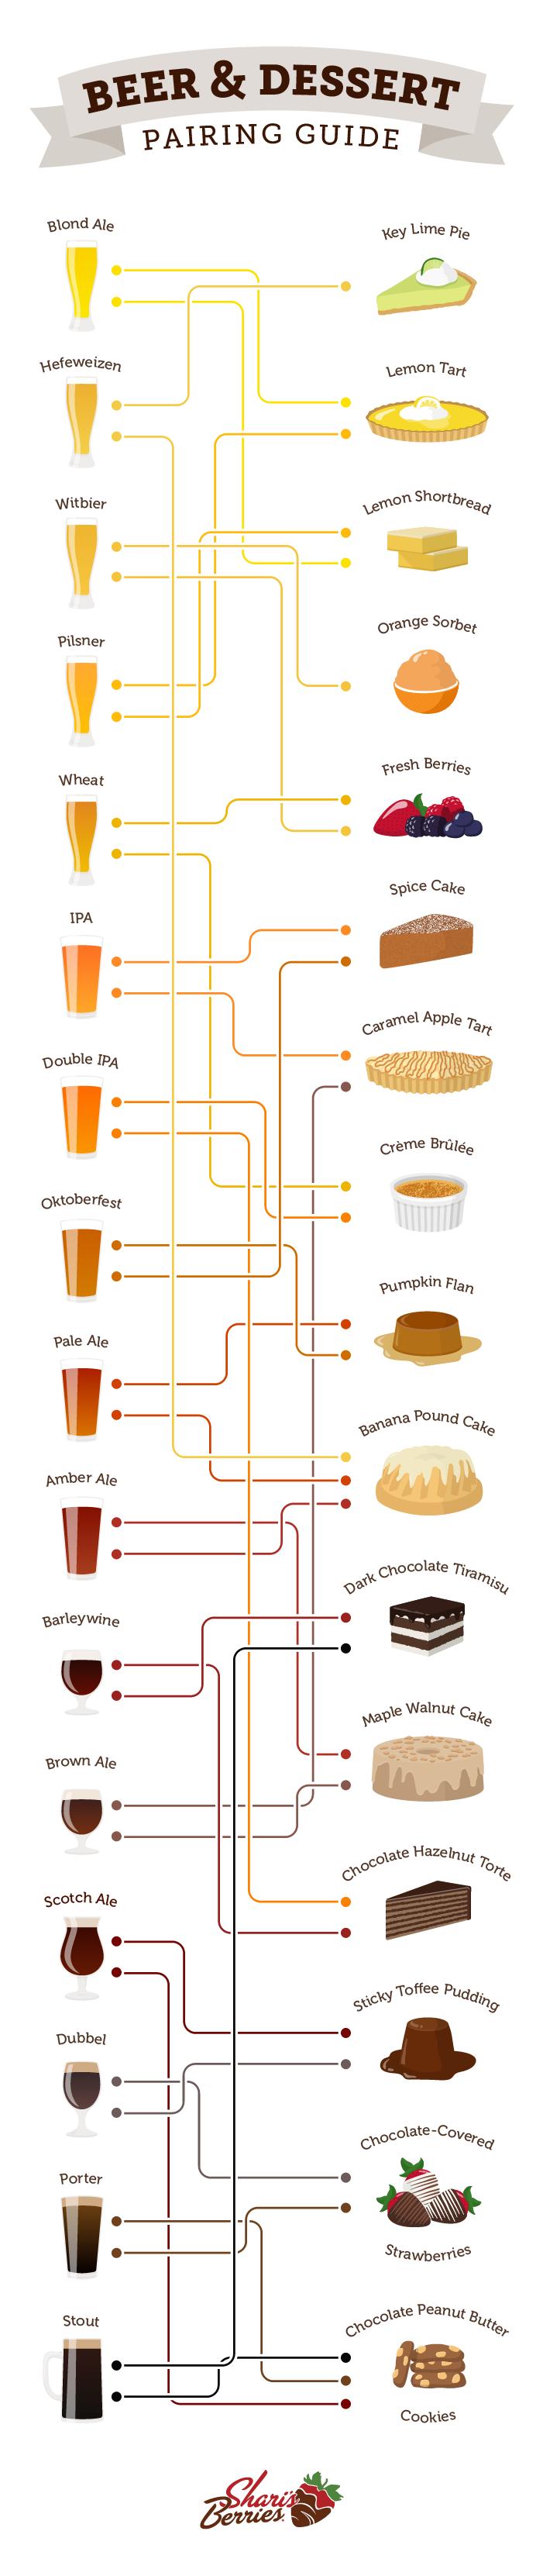 Сочетание пива и десертов